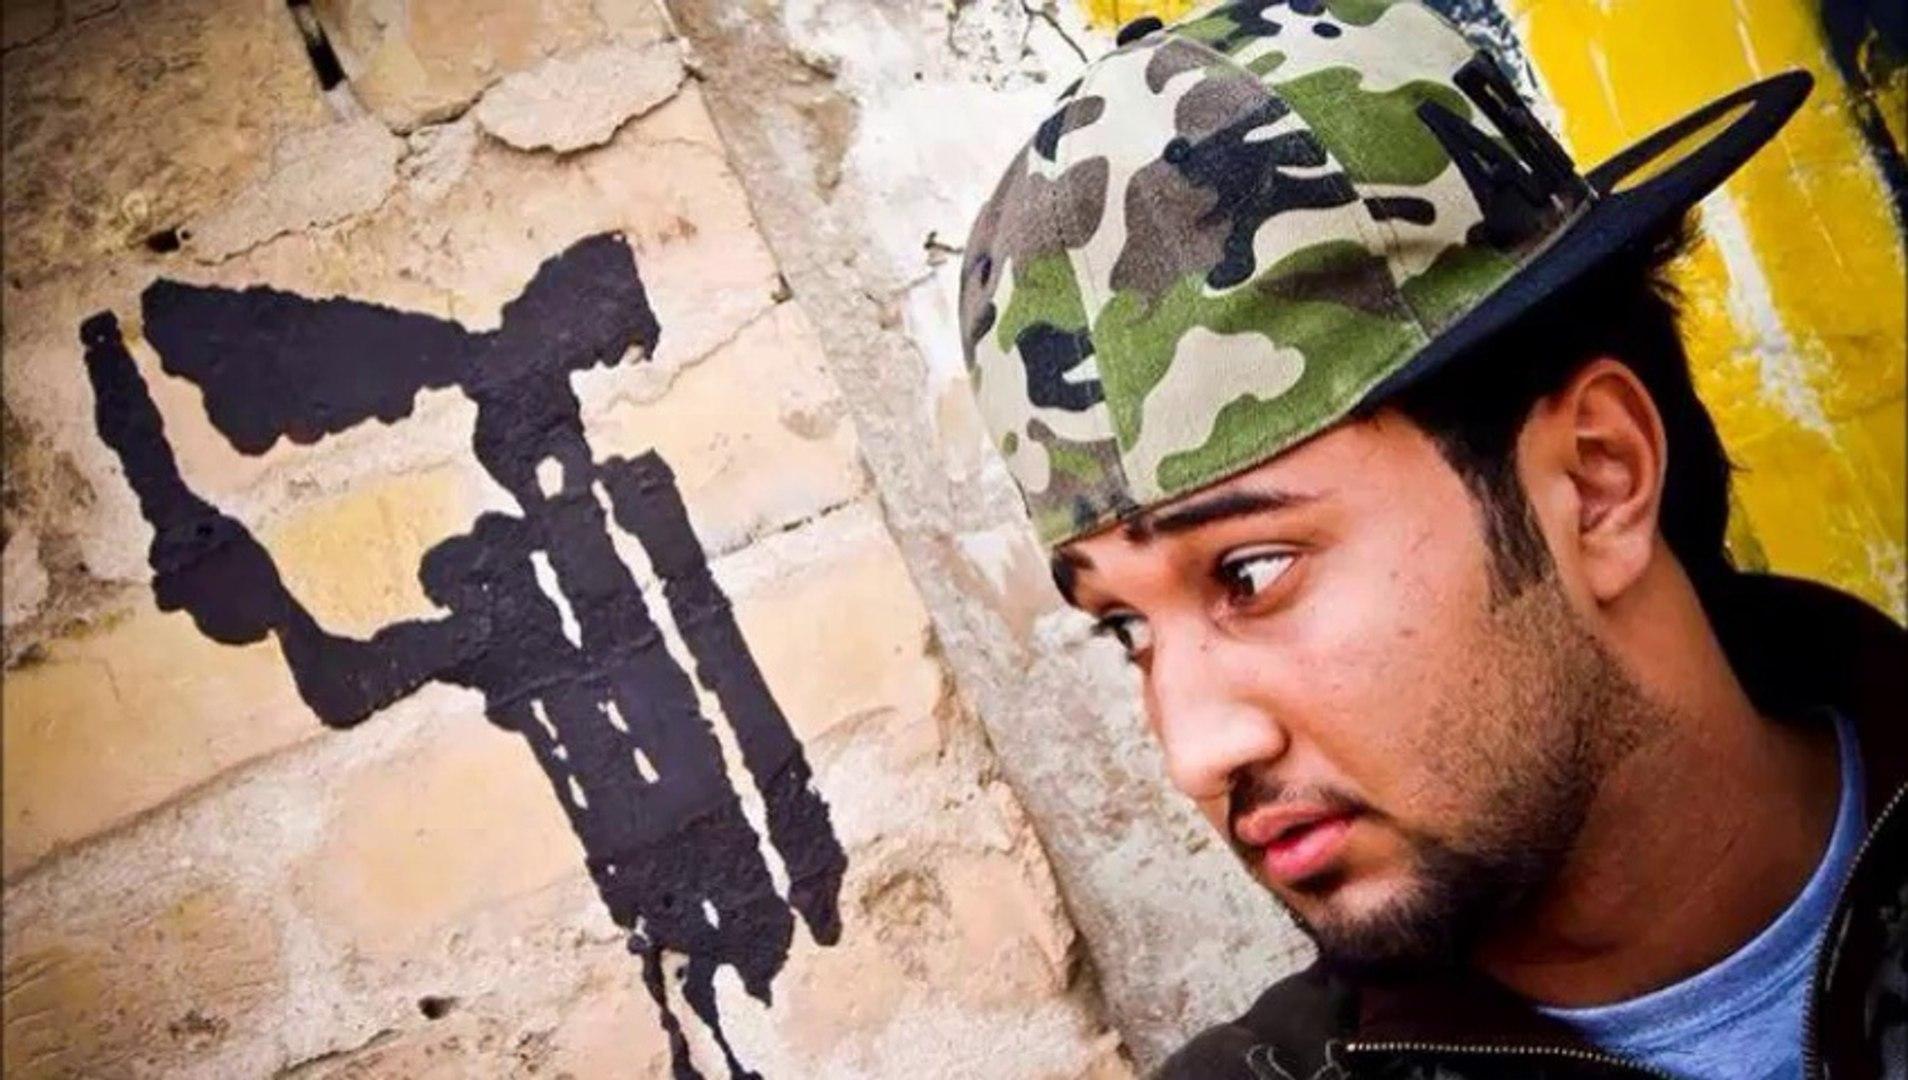 Tupac Ft. Elton John - Ghetto Gospel - AyRab ReMiX - راب عراقي - صرخة موت - أحمد أي-راب